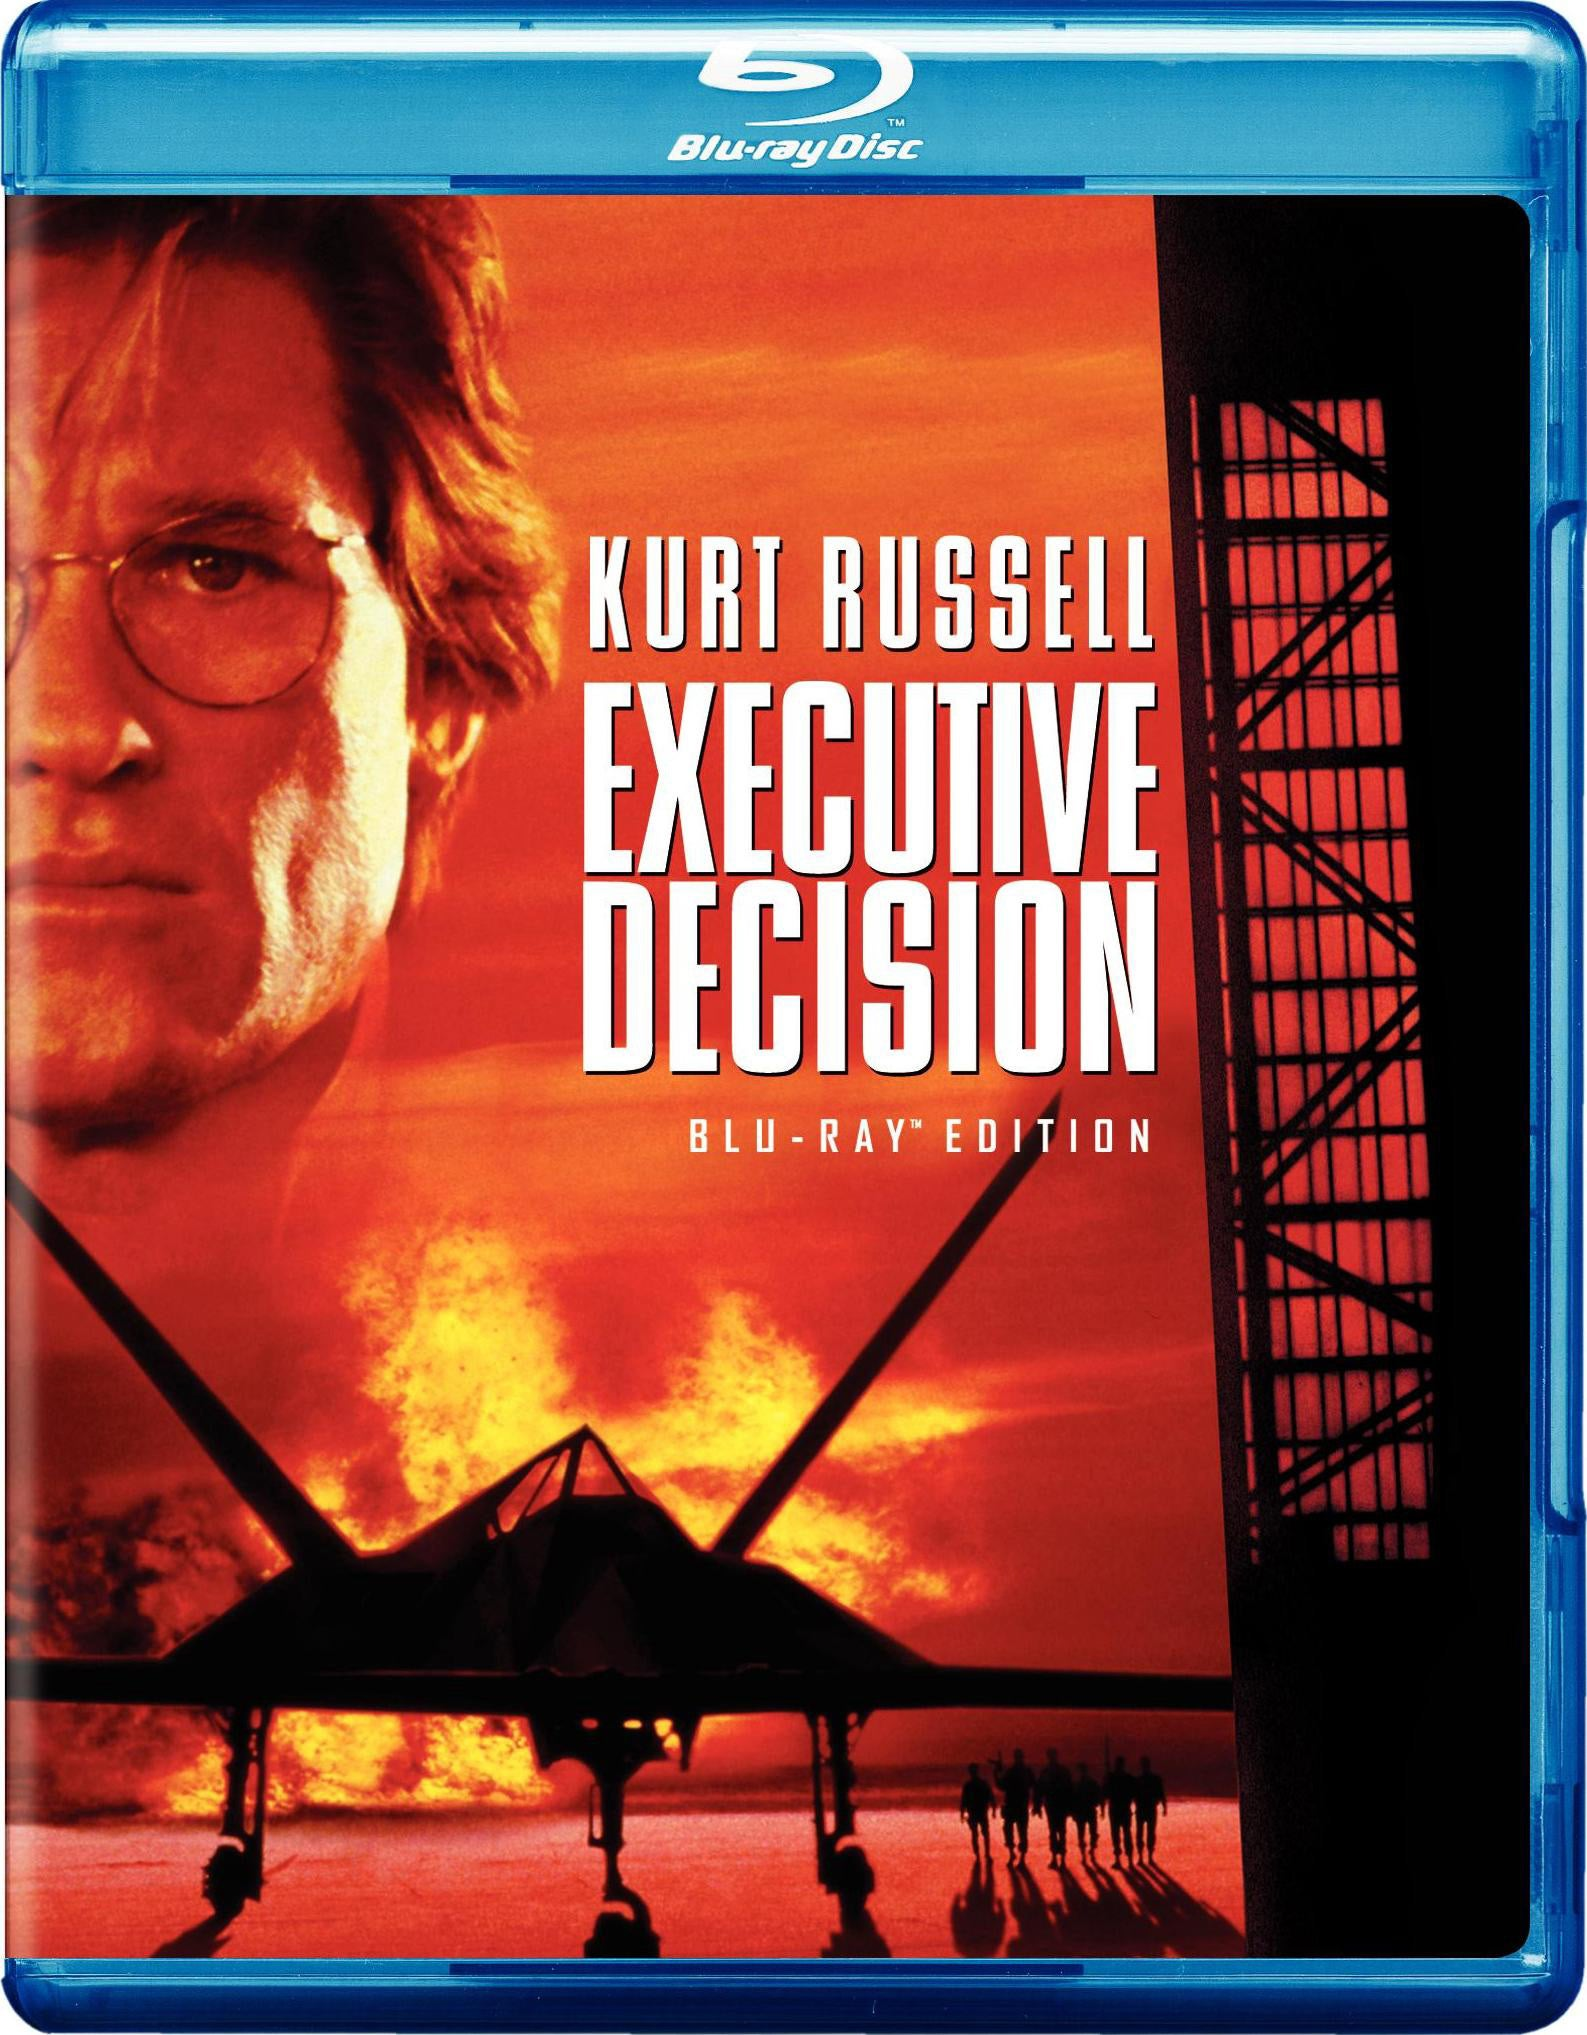 Executive Decision (Blu-ray Disc)